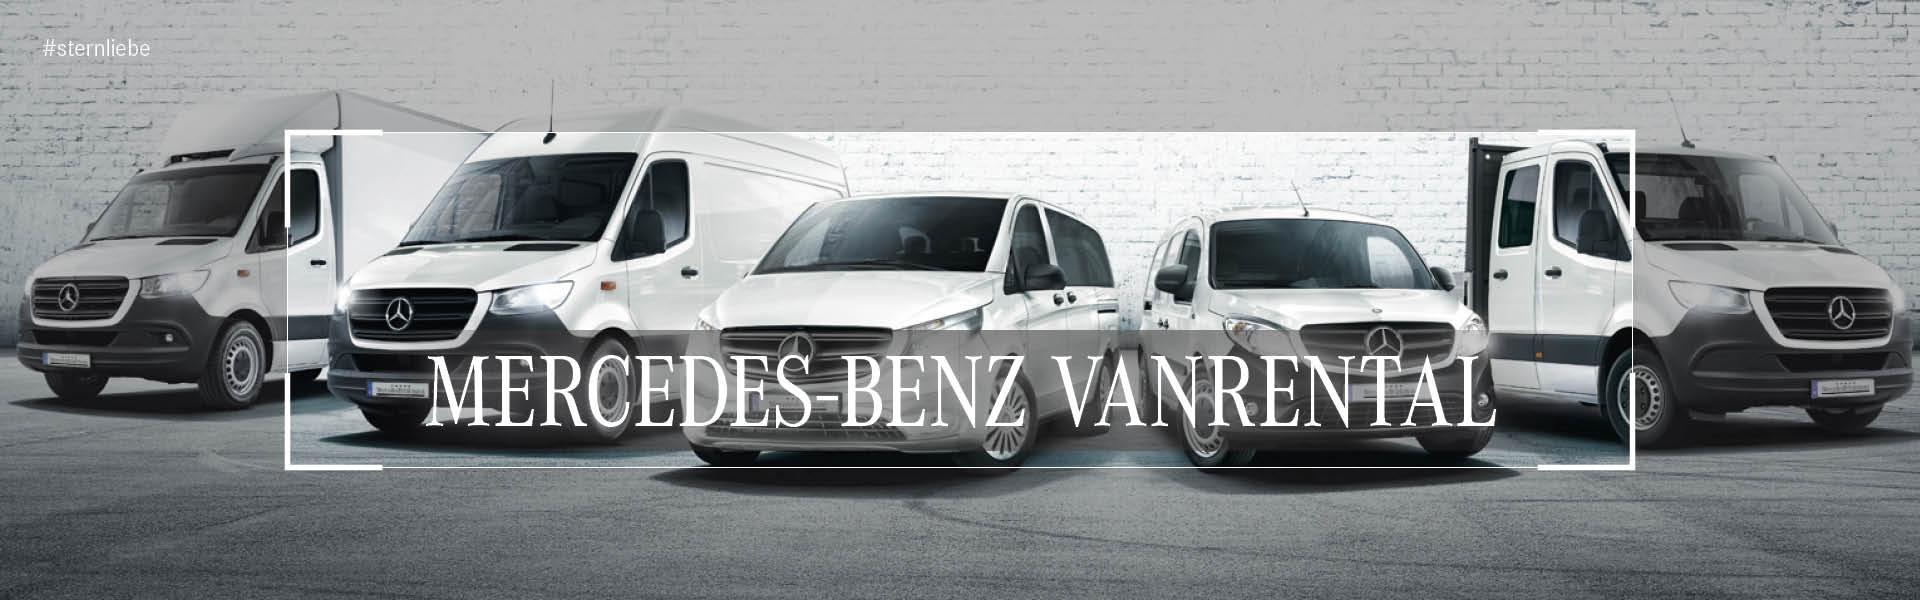 Banner-VanRental Mercedes Benz Mieten Kaufen